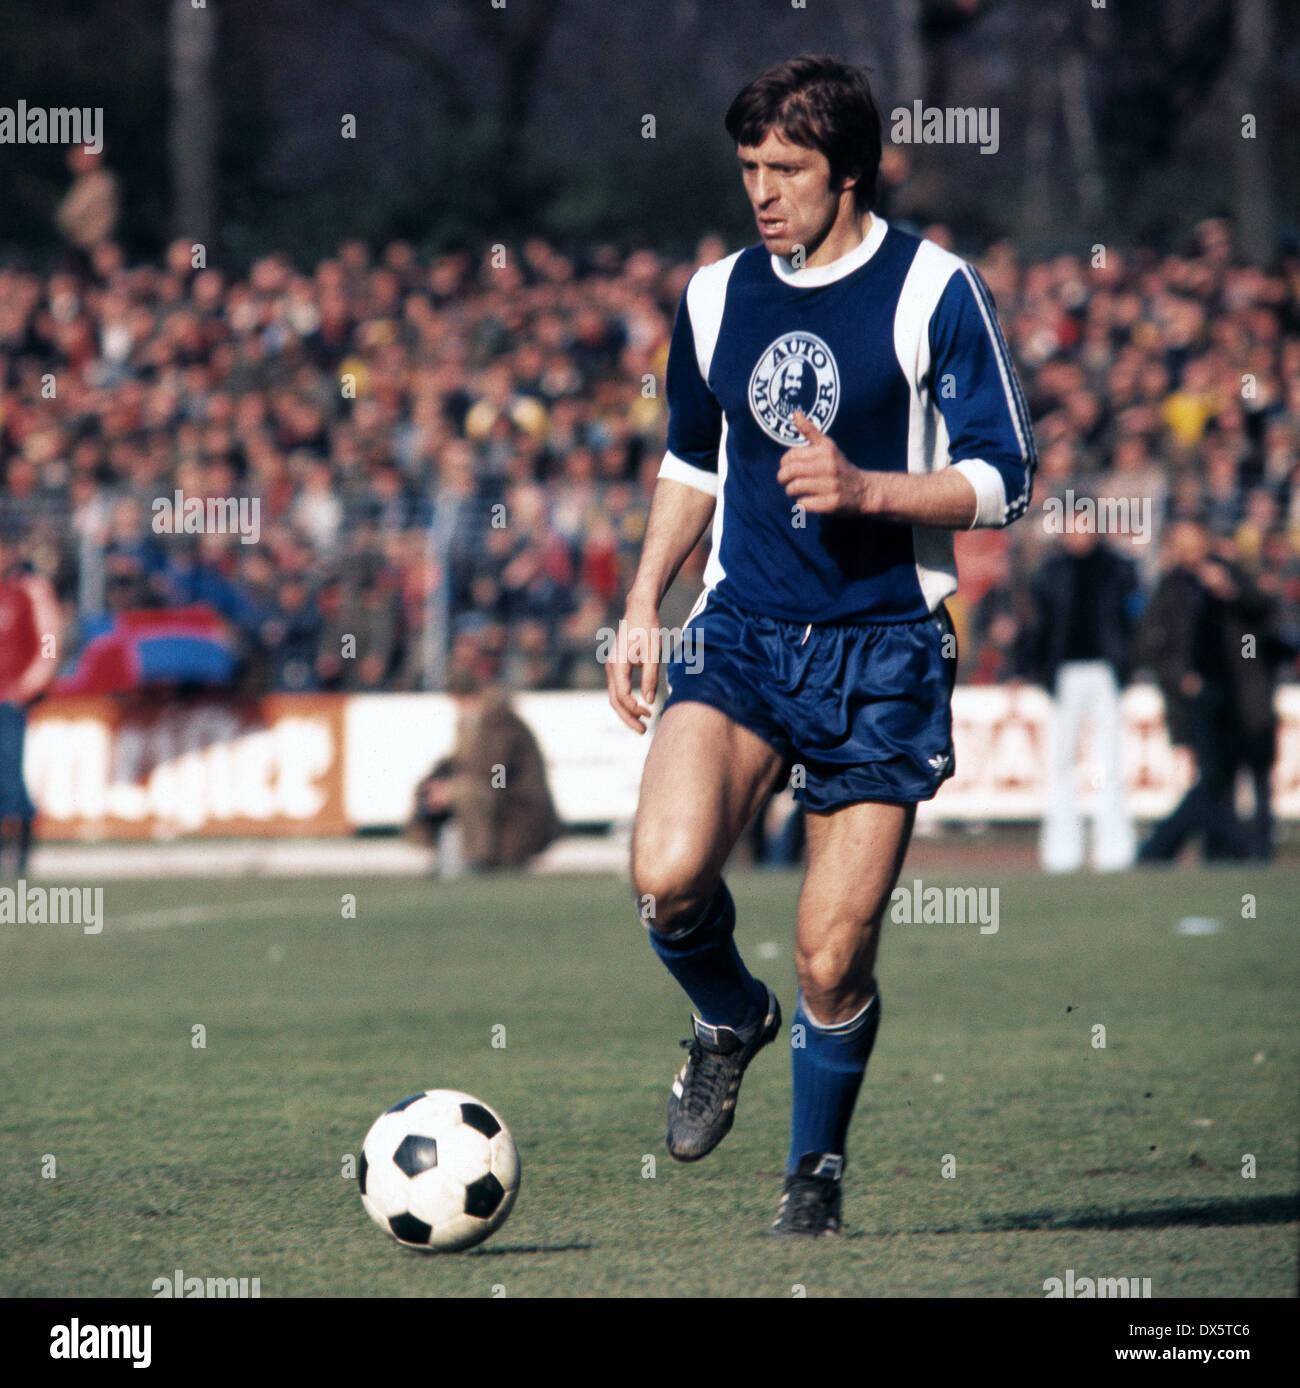 football, DFB Cup, 1976/1977, semifinal, Grotenburg Stadium, FC Bayer 05 Uerdingen versus Hertha BSC Berlin 0:1, scene of the match, Lorenz Horr (Hertha) in ball possession - Stock Image